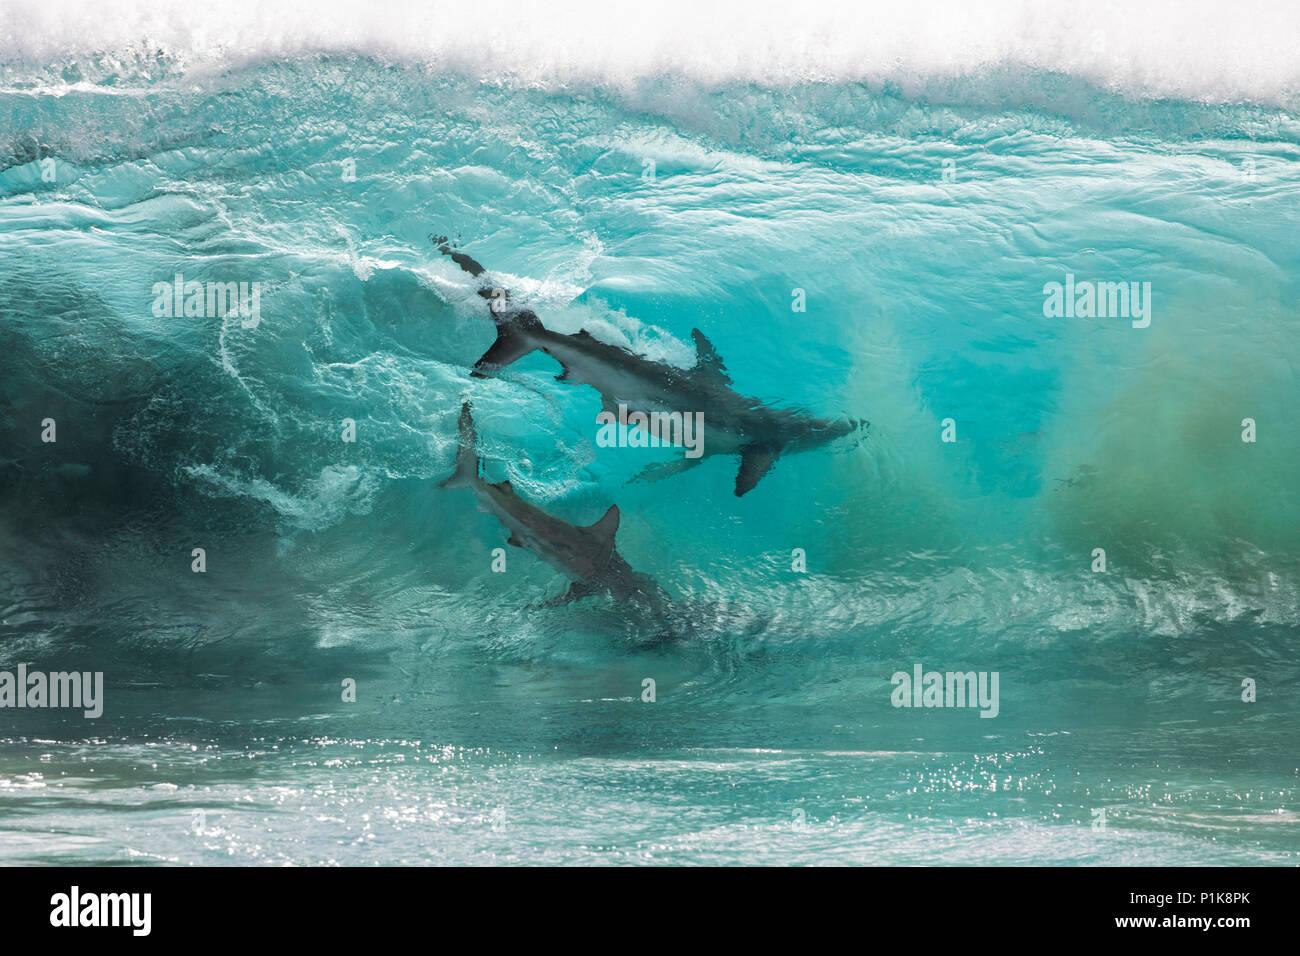 Sharks feeding on a bait ball in the breaking ocean waves, Carnarvon, Western Australia, Australia - Stock Image